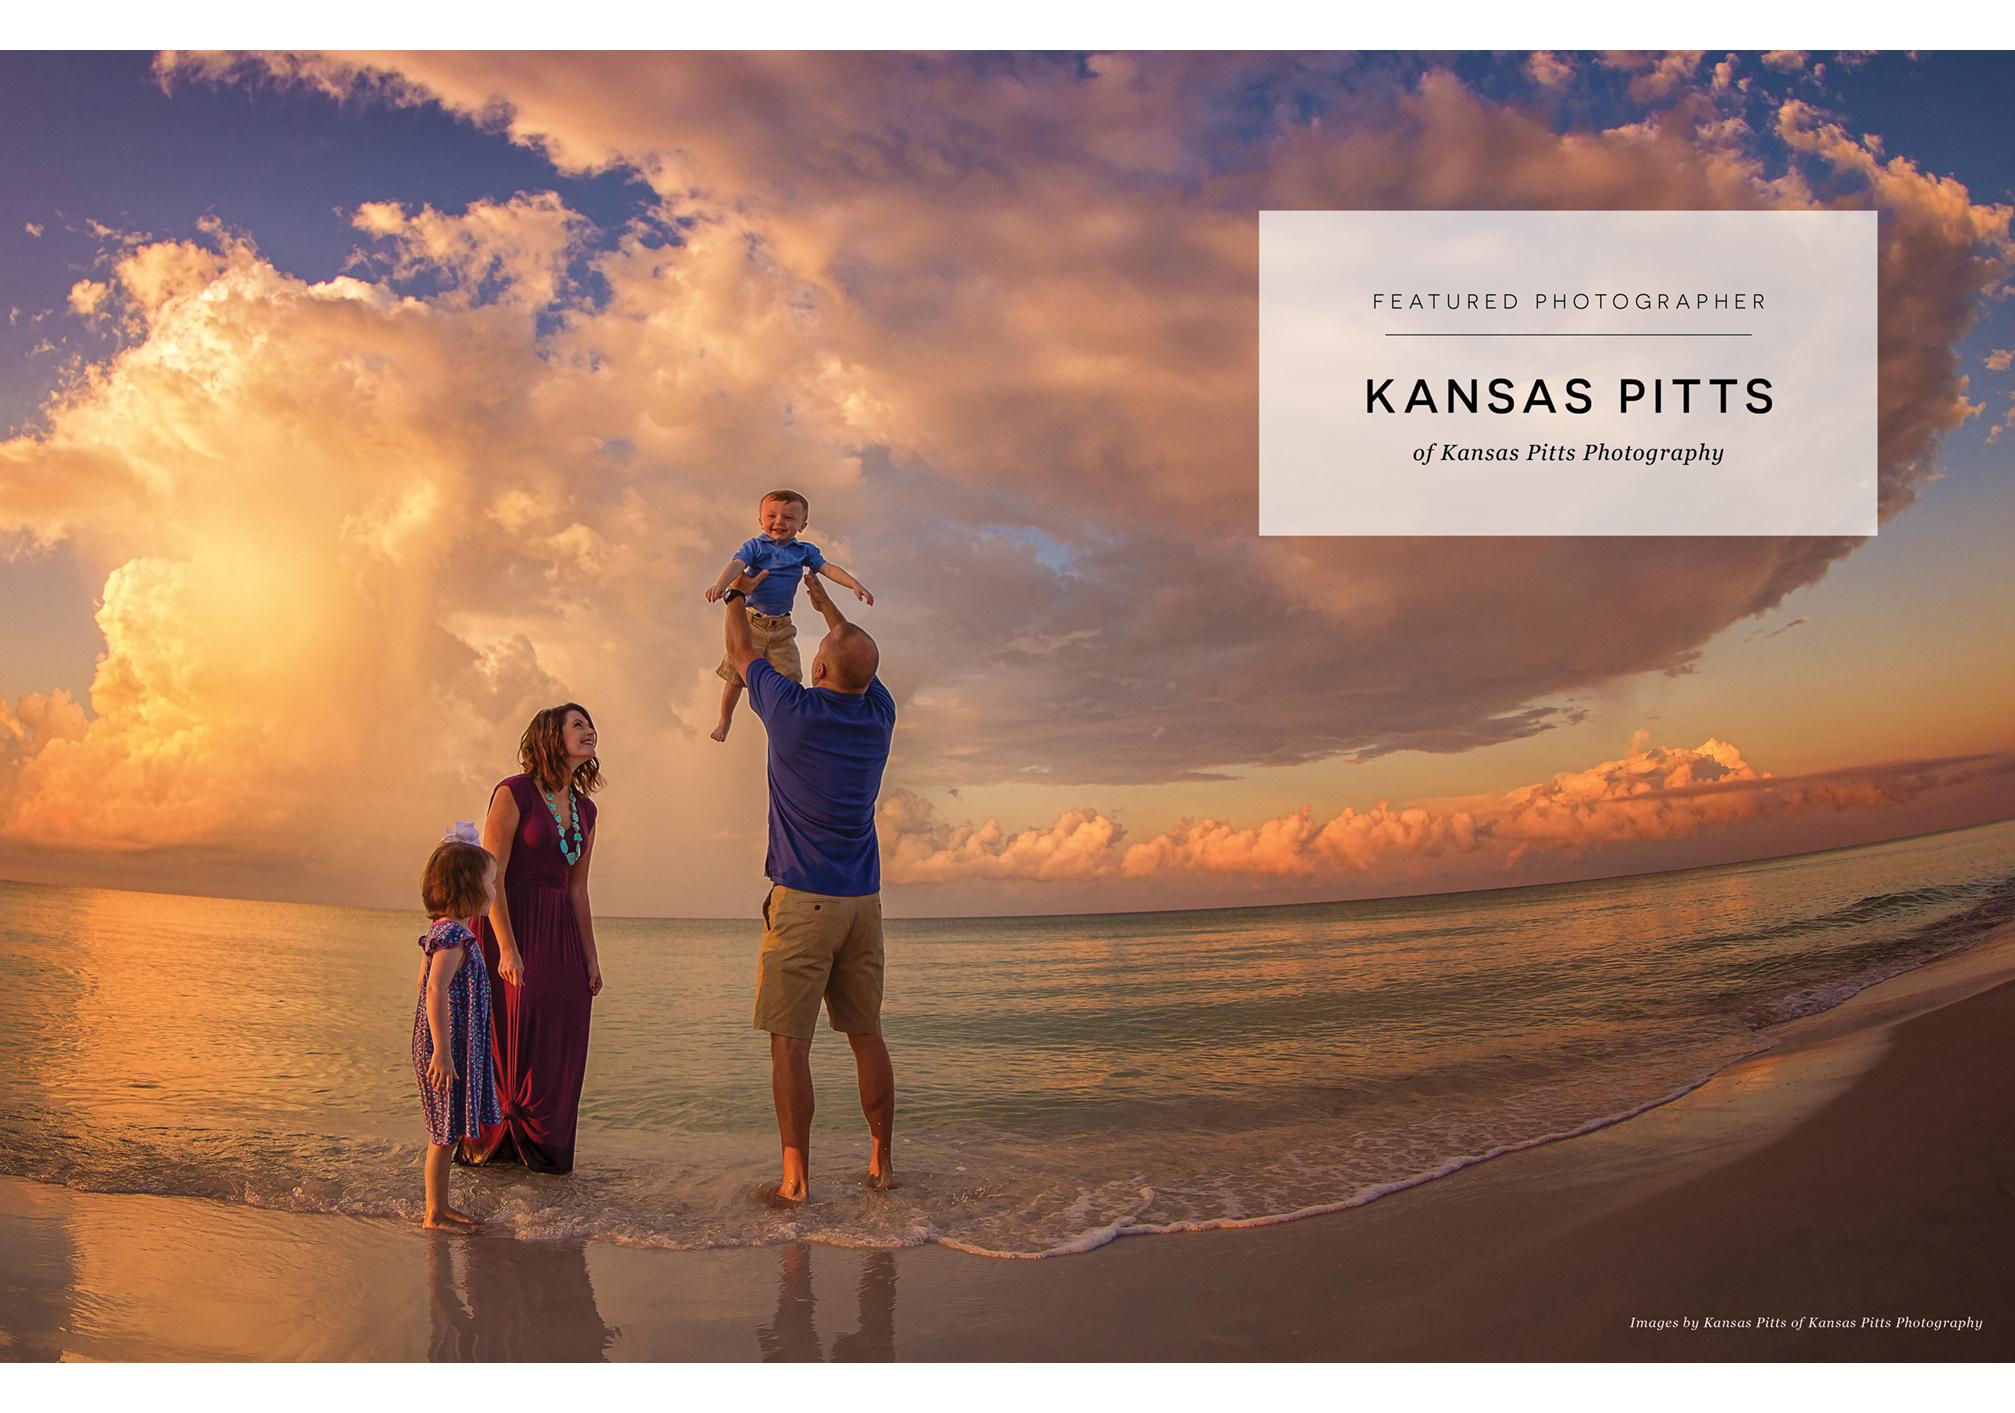 Featured Photographer Kansas Pitts of Kansas Pitts Photography